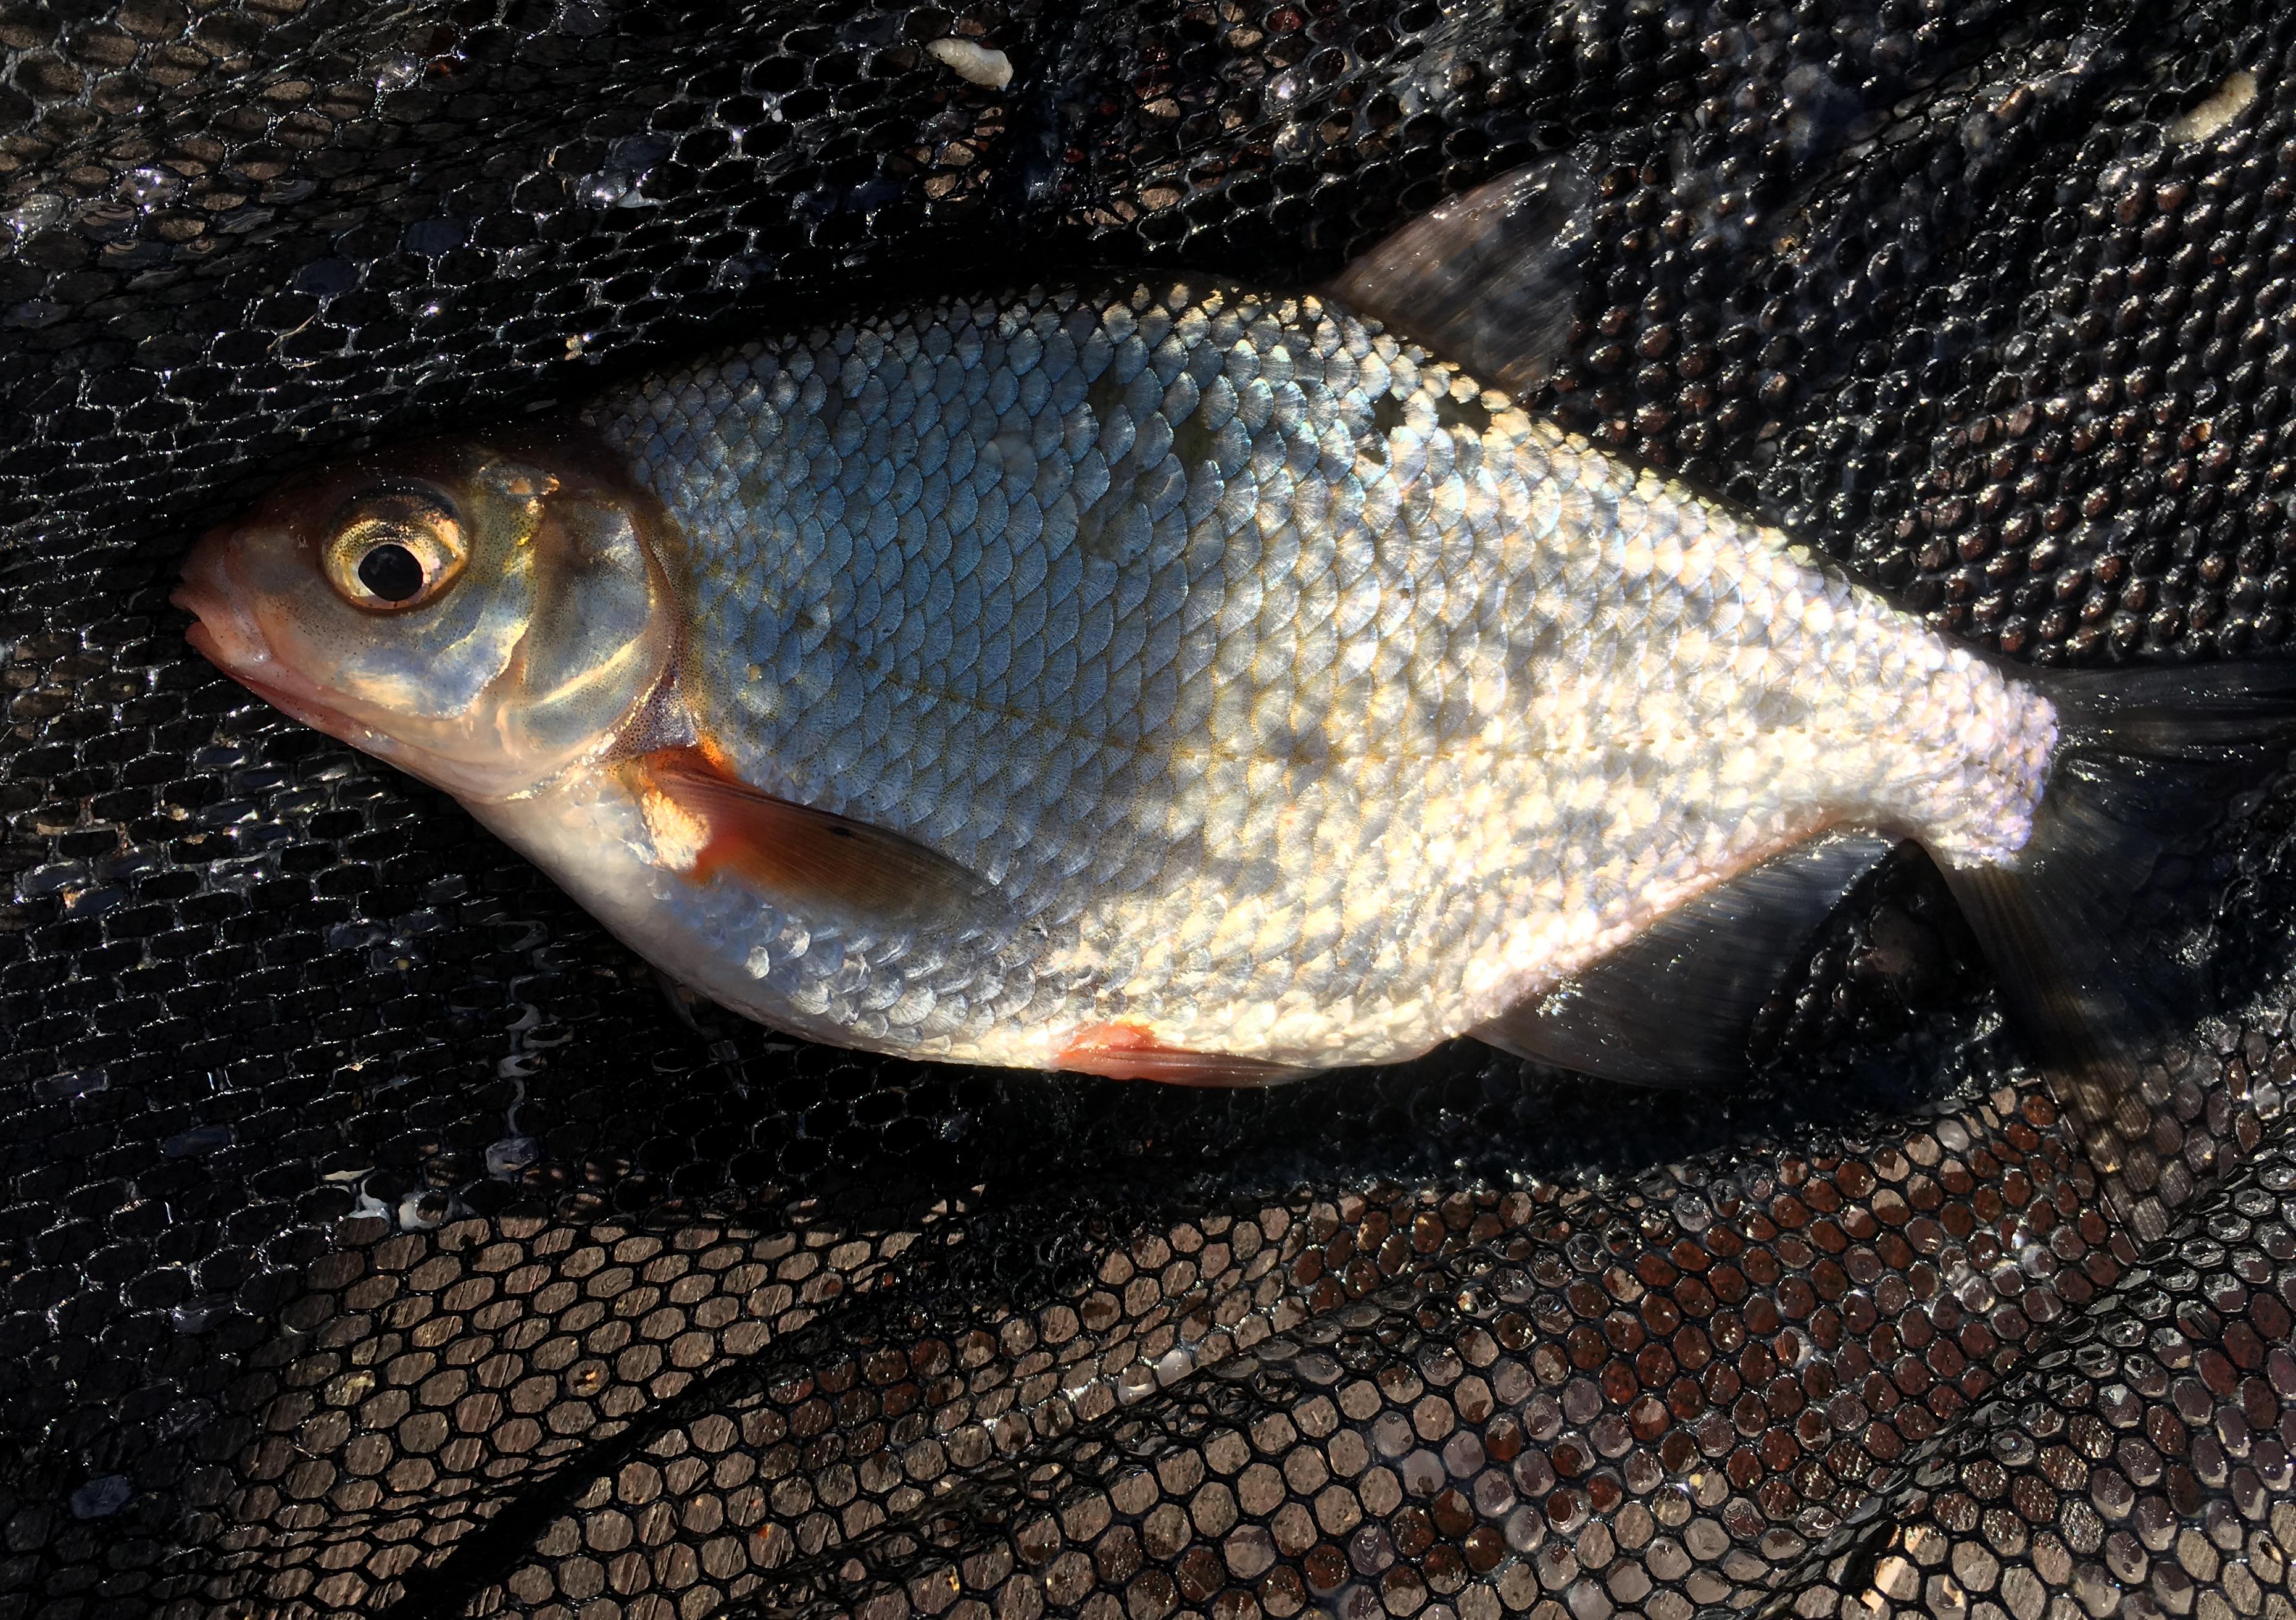 рыбалка Юрмала Латвия Лиелупе пейзажи природы густера Альберт Сафиуллин Albert Safiullin